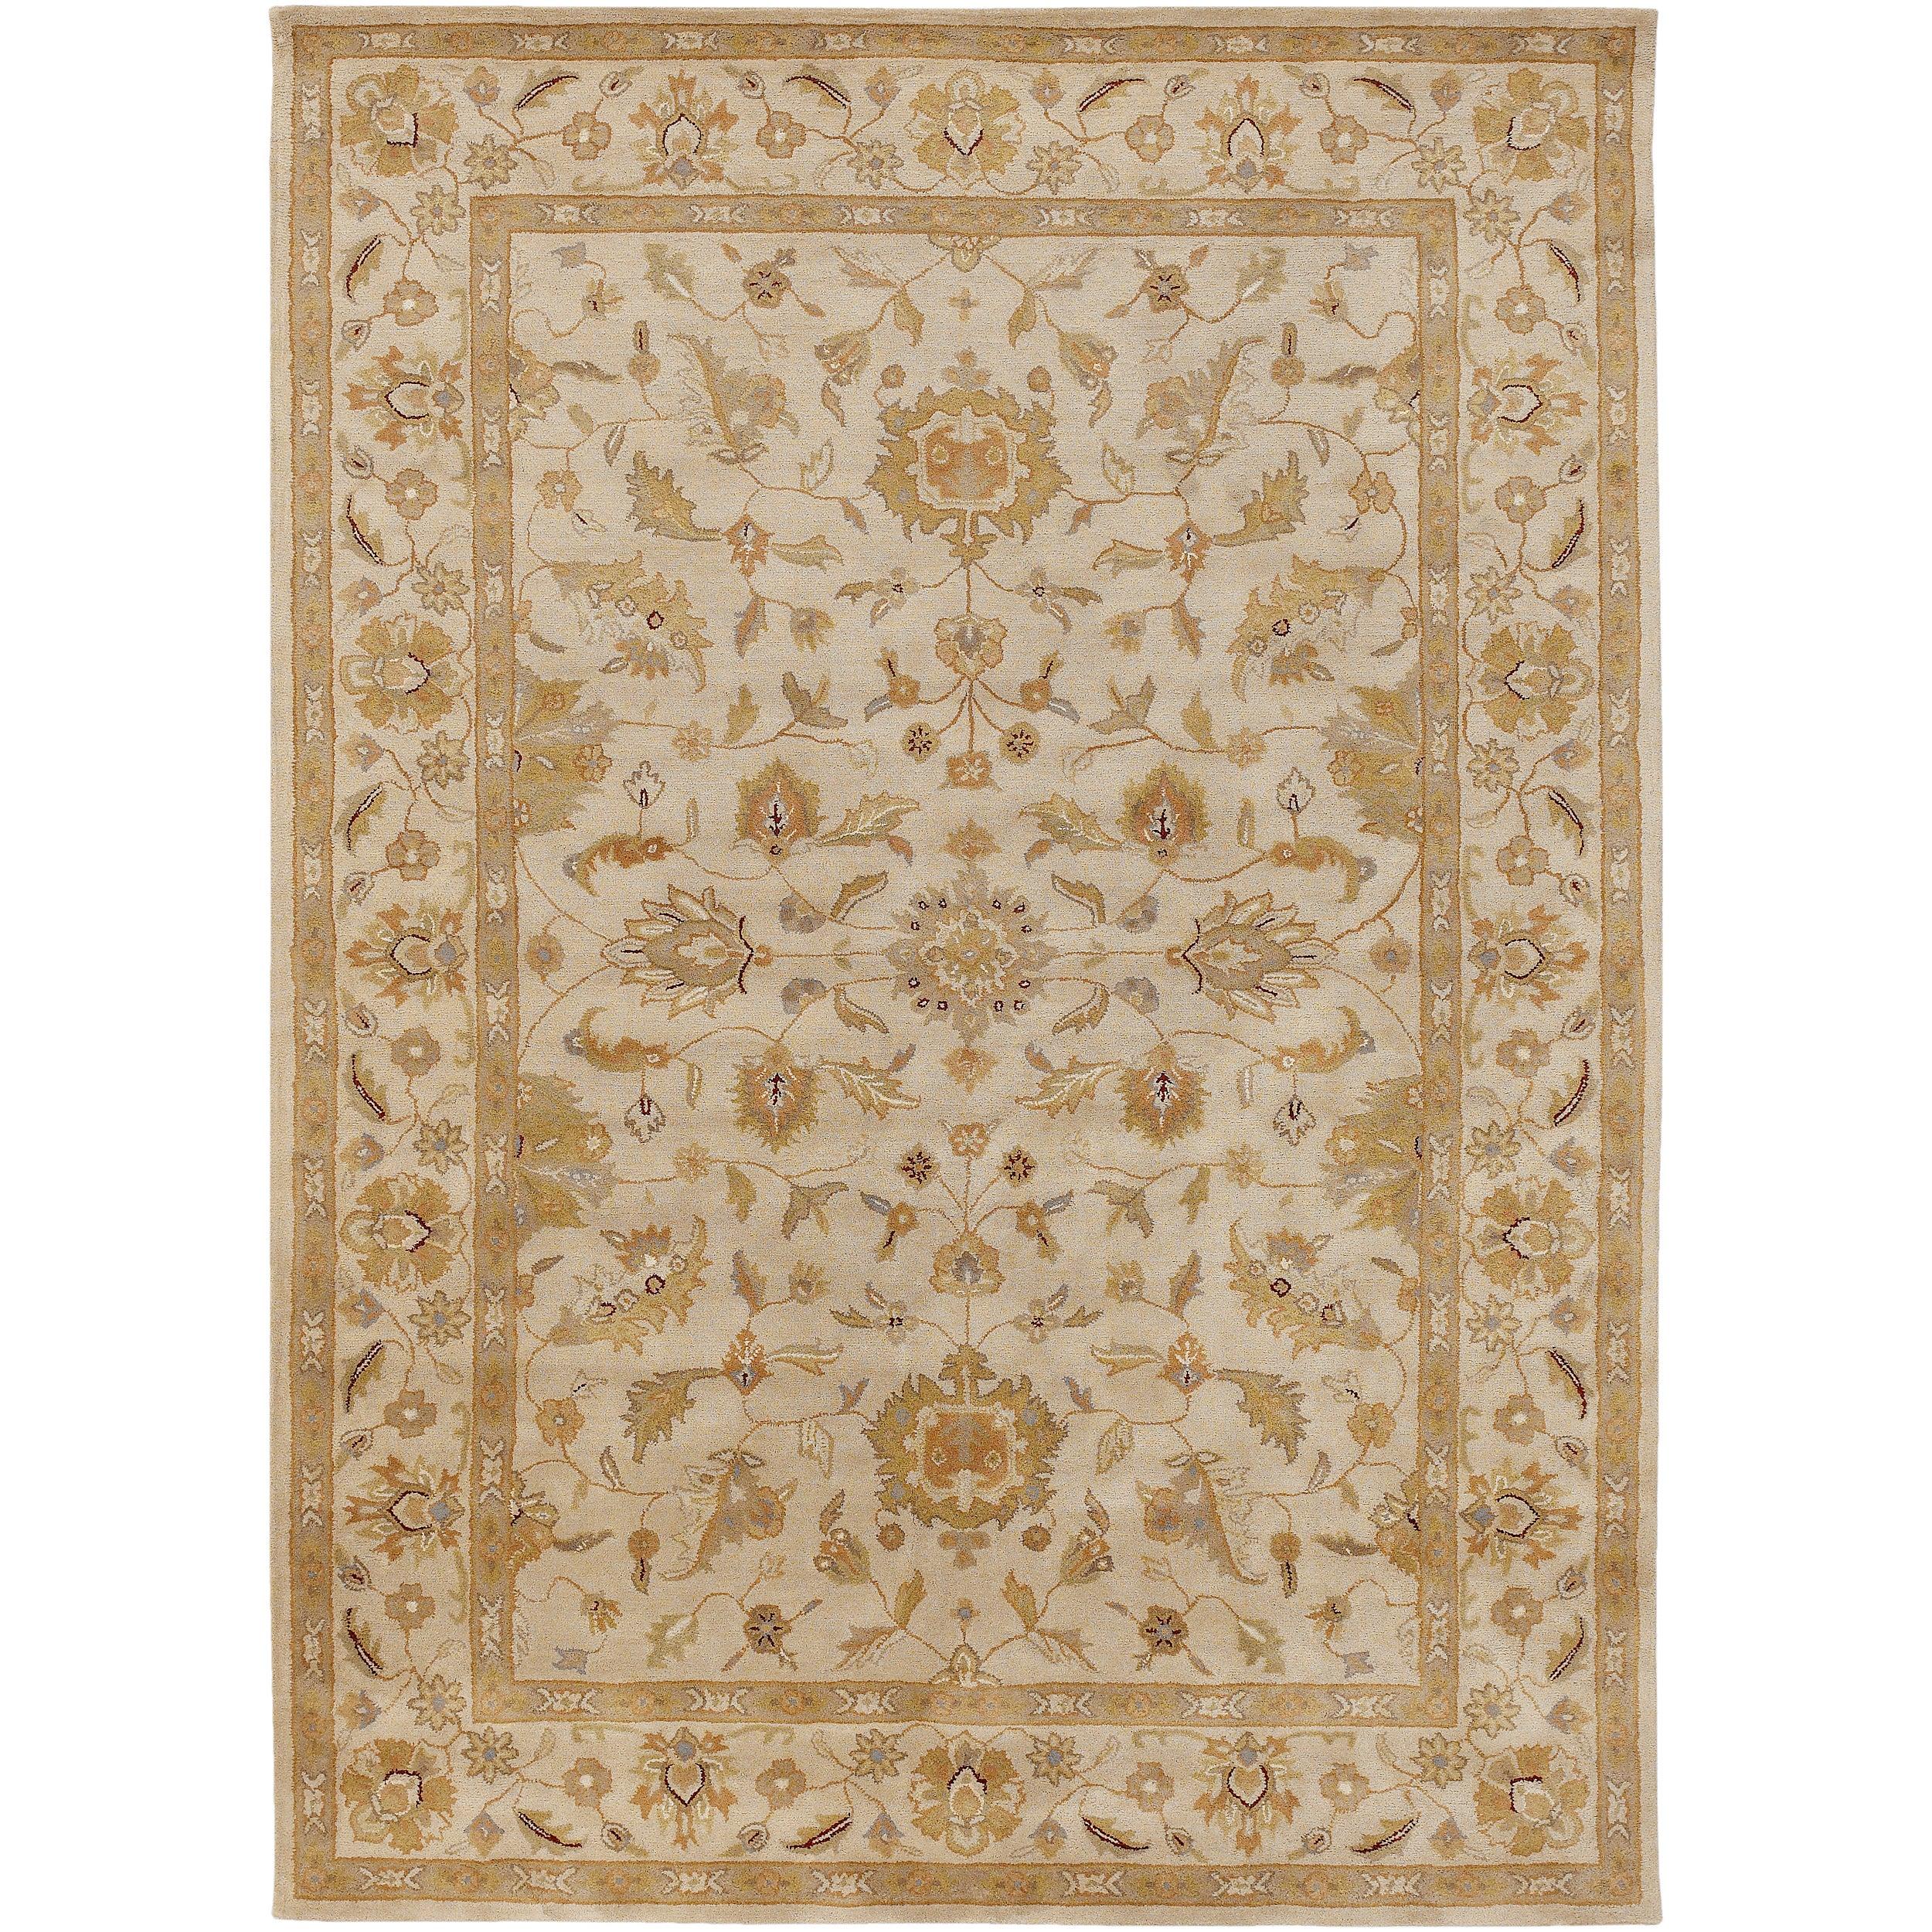 Hand-tufted Ashford Ivory Floral Border Wool Rug (12' x 15')